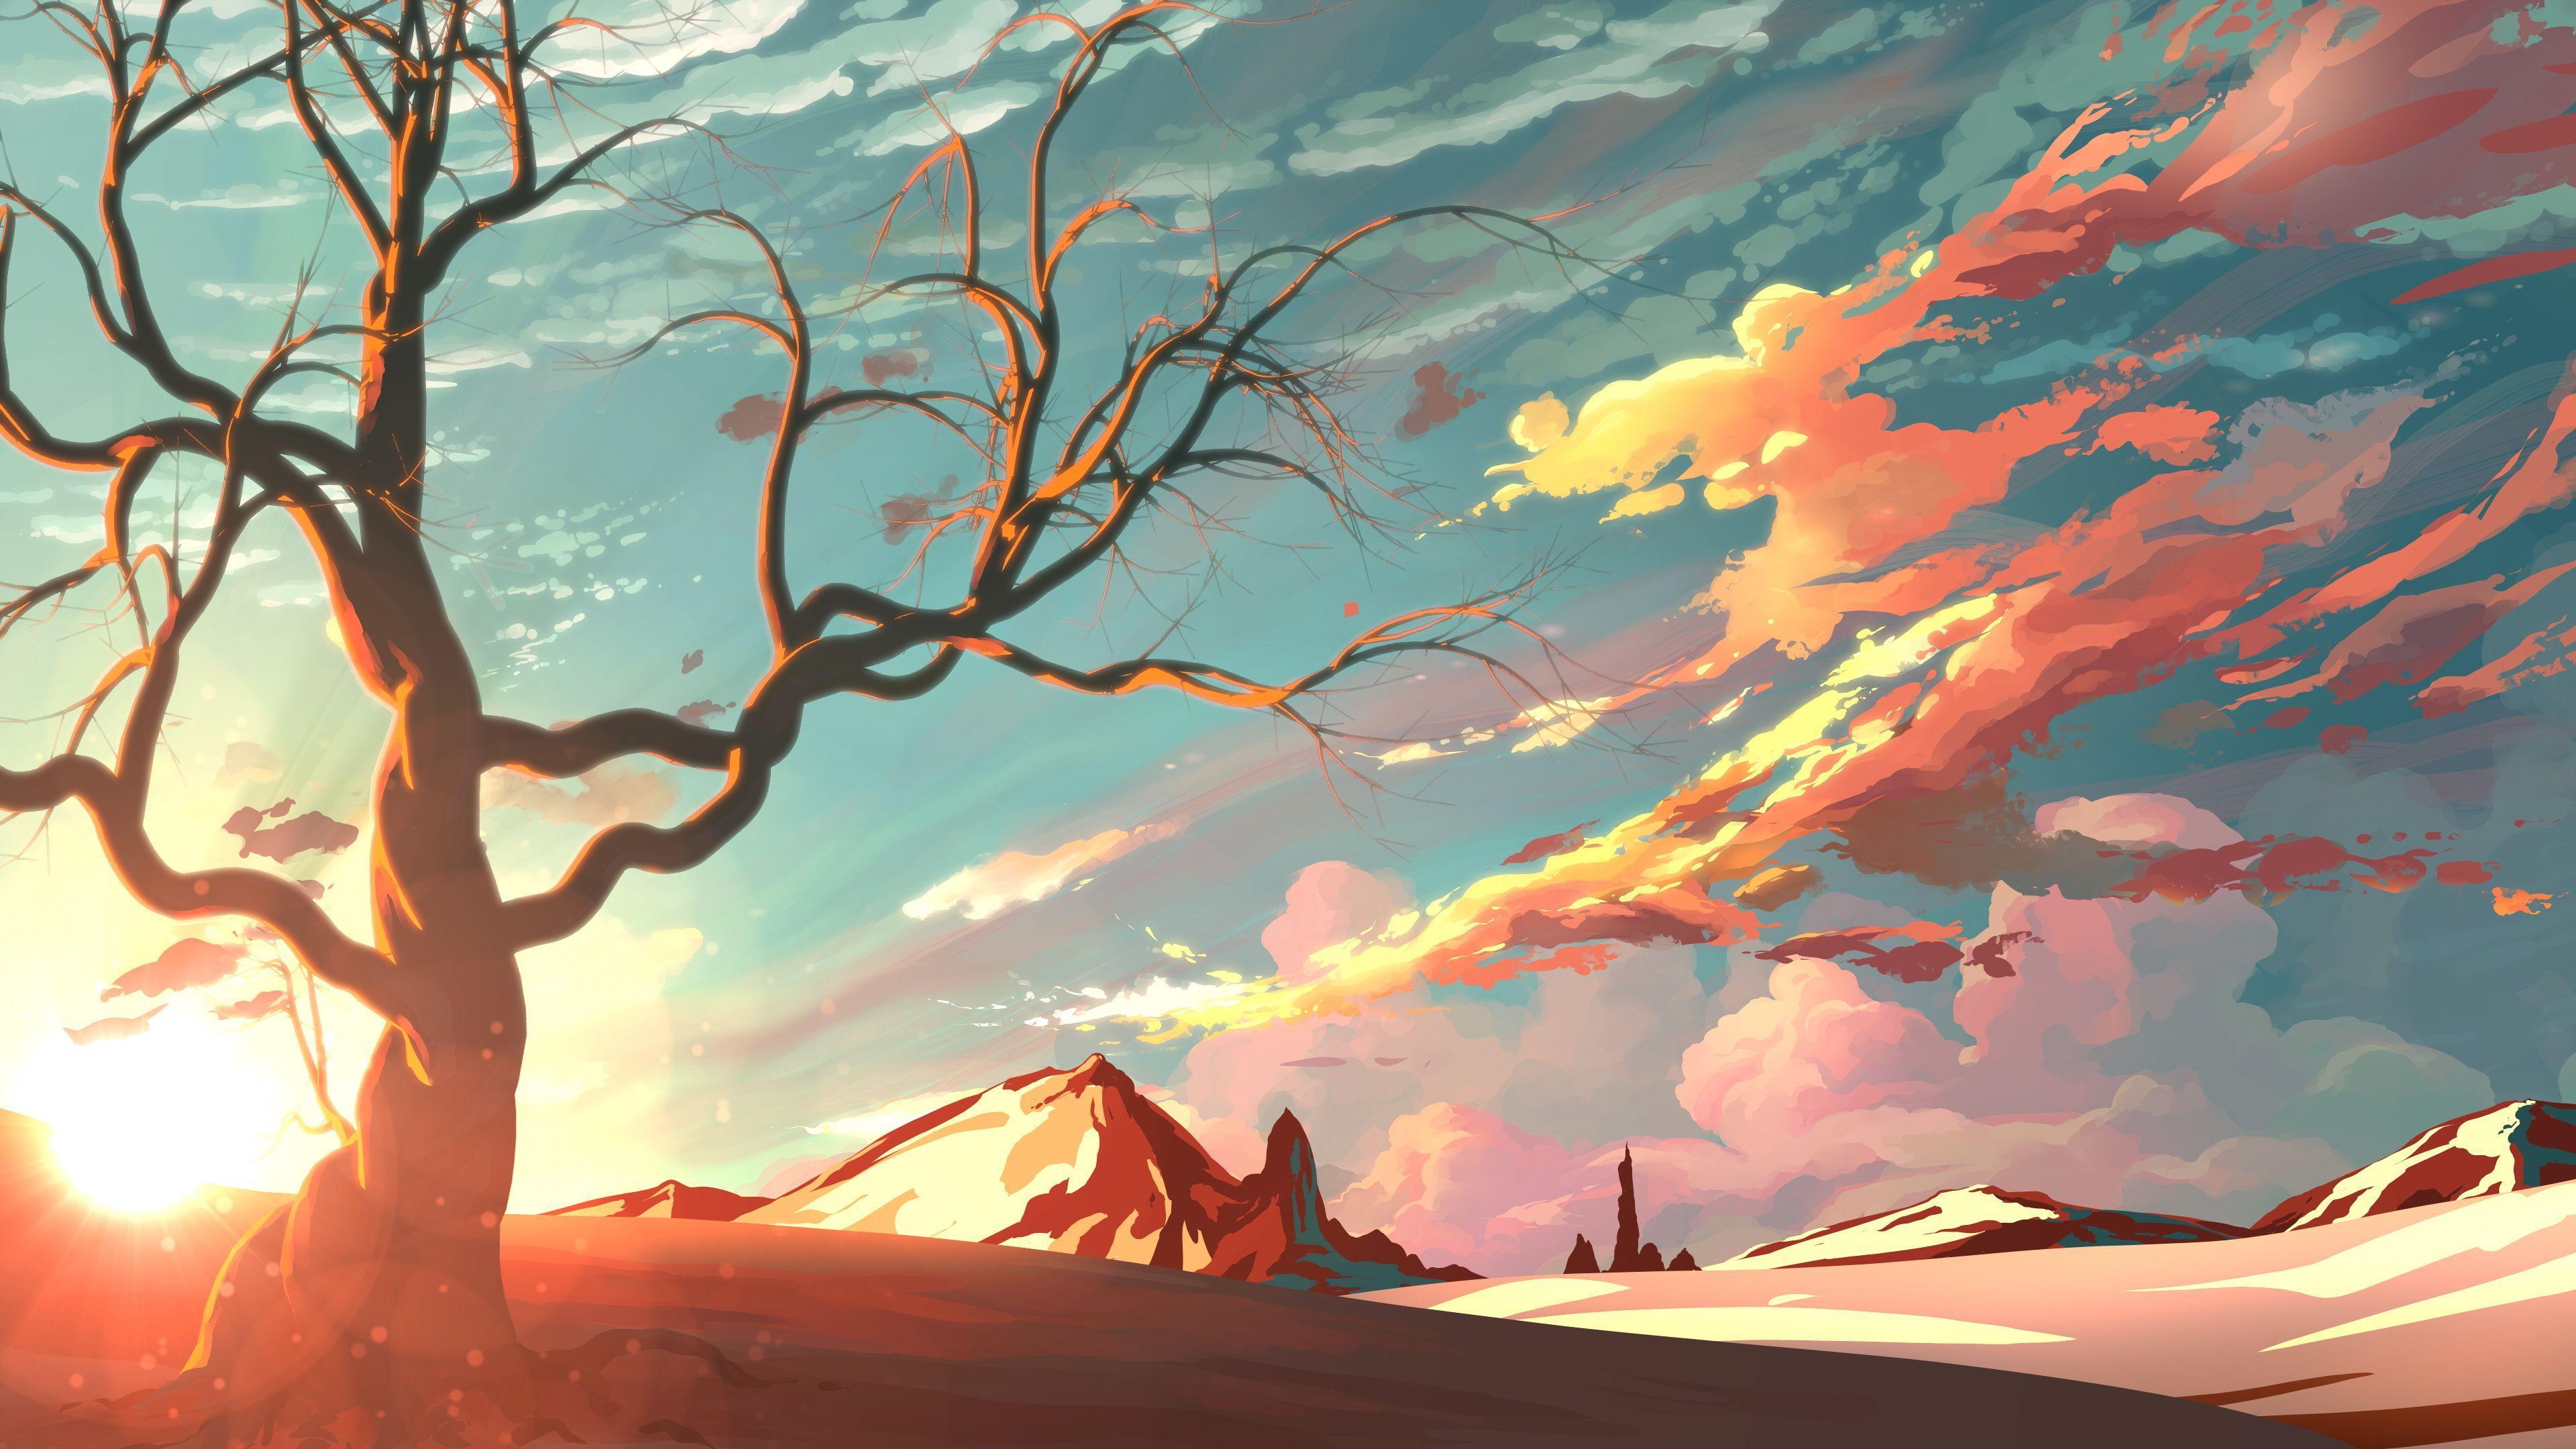 Artistic Landscape Wallpapers Top Free Artistic Landscape Backgrounds Wallpaperaccess